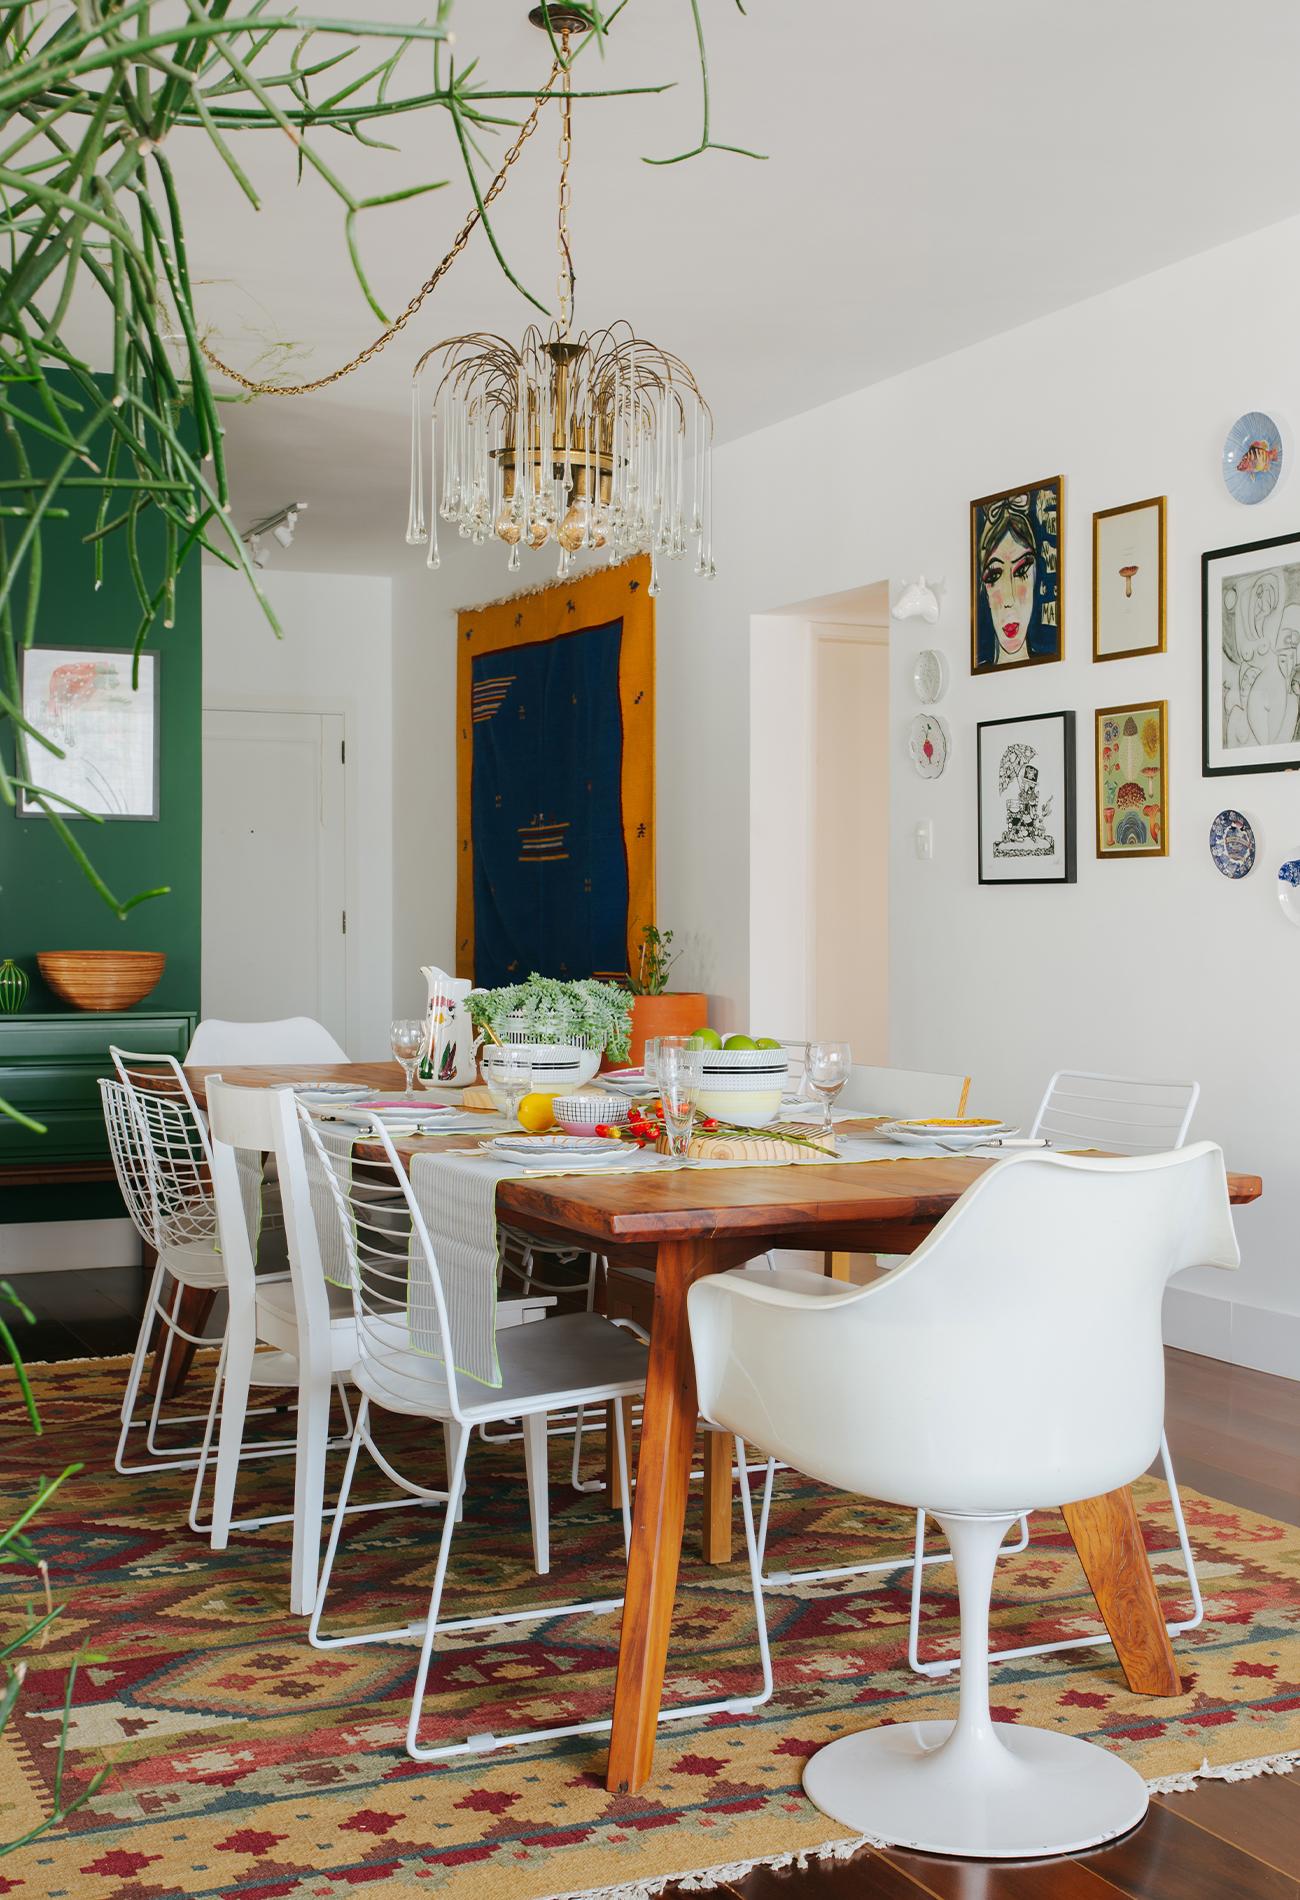 Apartamento chef Renata Vanzetto, sala de jantar colorida e acolhedora